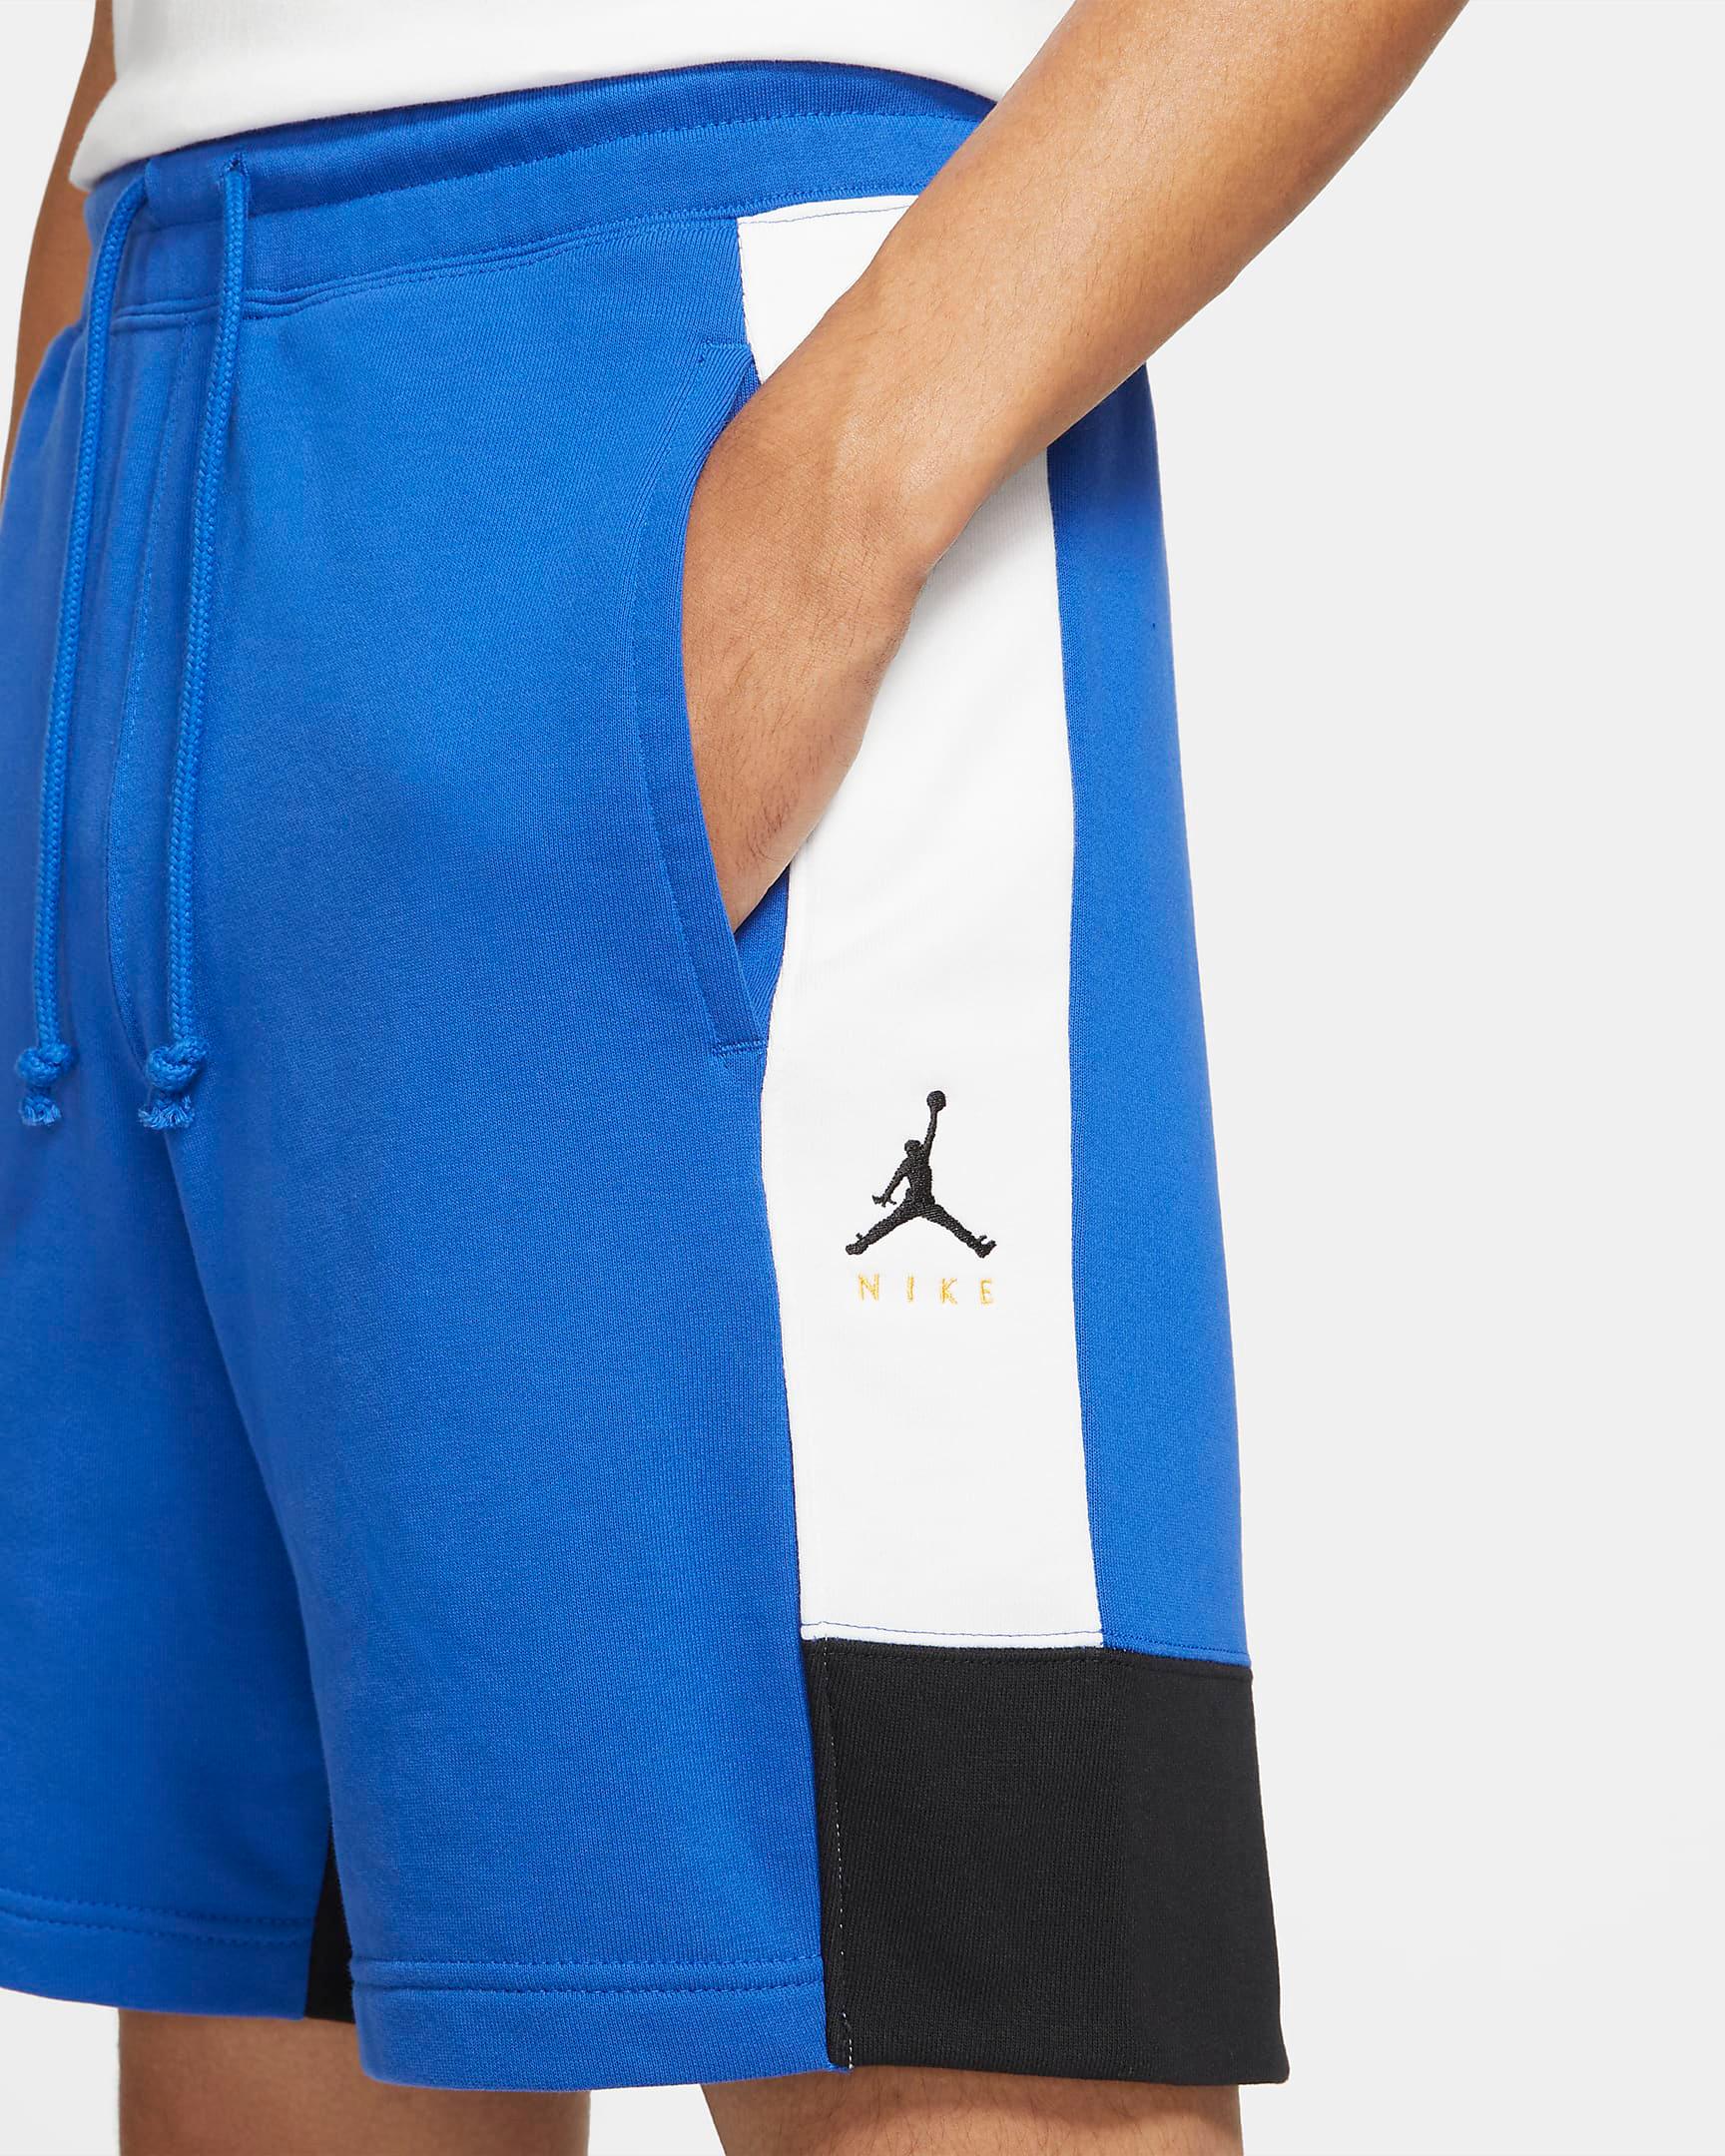 jordan-game-royal-jumpman-fleece-shorts-3